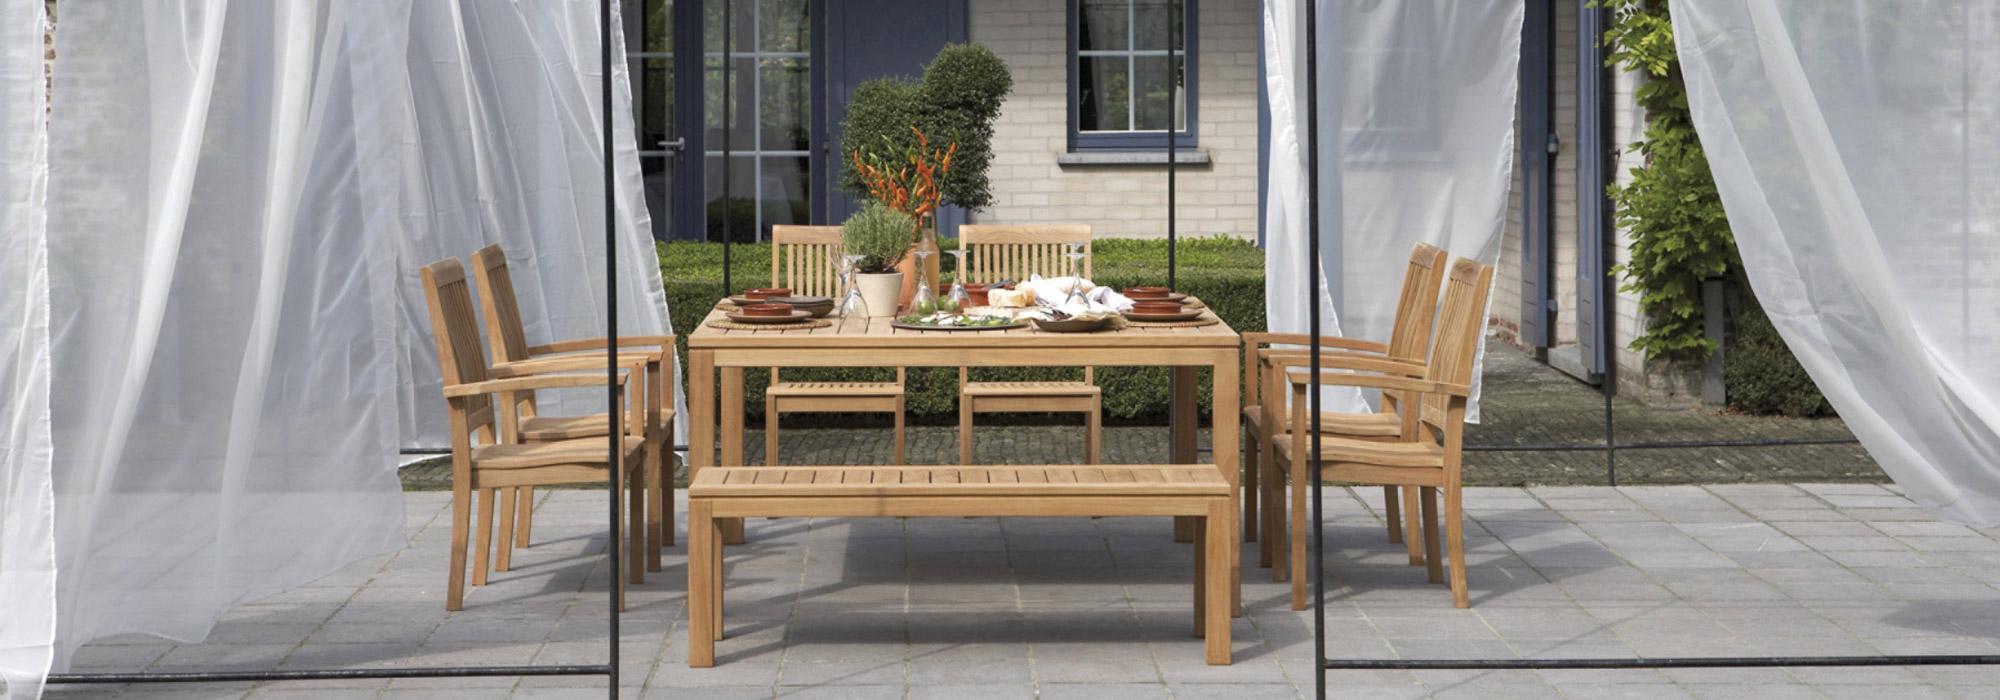 Landsitz Mehle - Gartenmöbel   Teak Gartenmöbel günstig